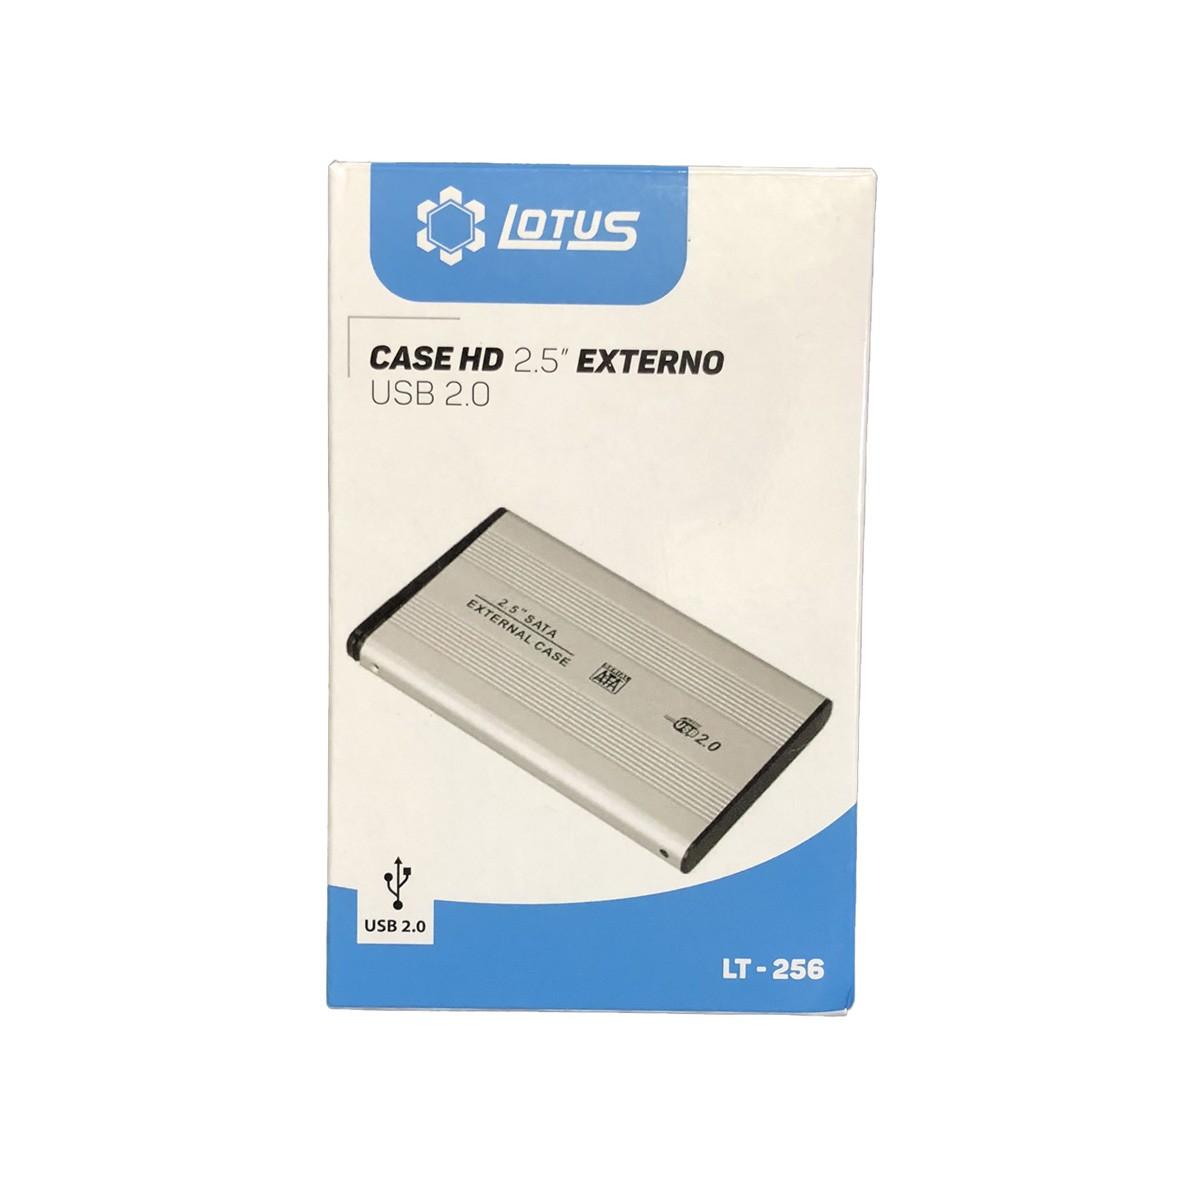 Case para HD Externo 2.5 Polegadas USB 2.0 LT-256 Lotus